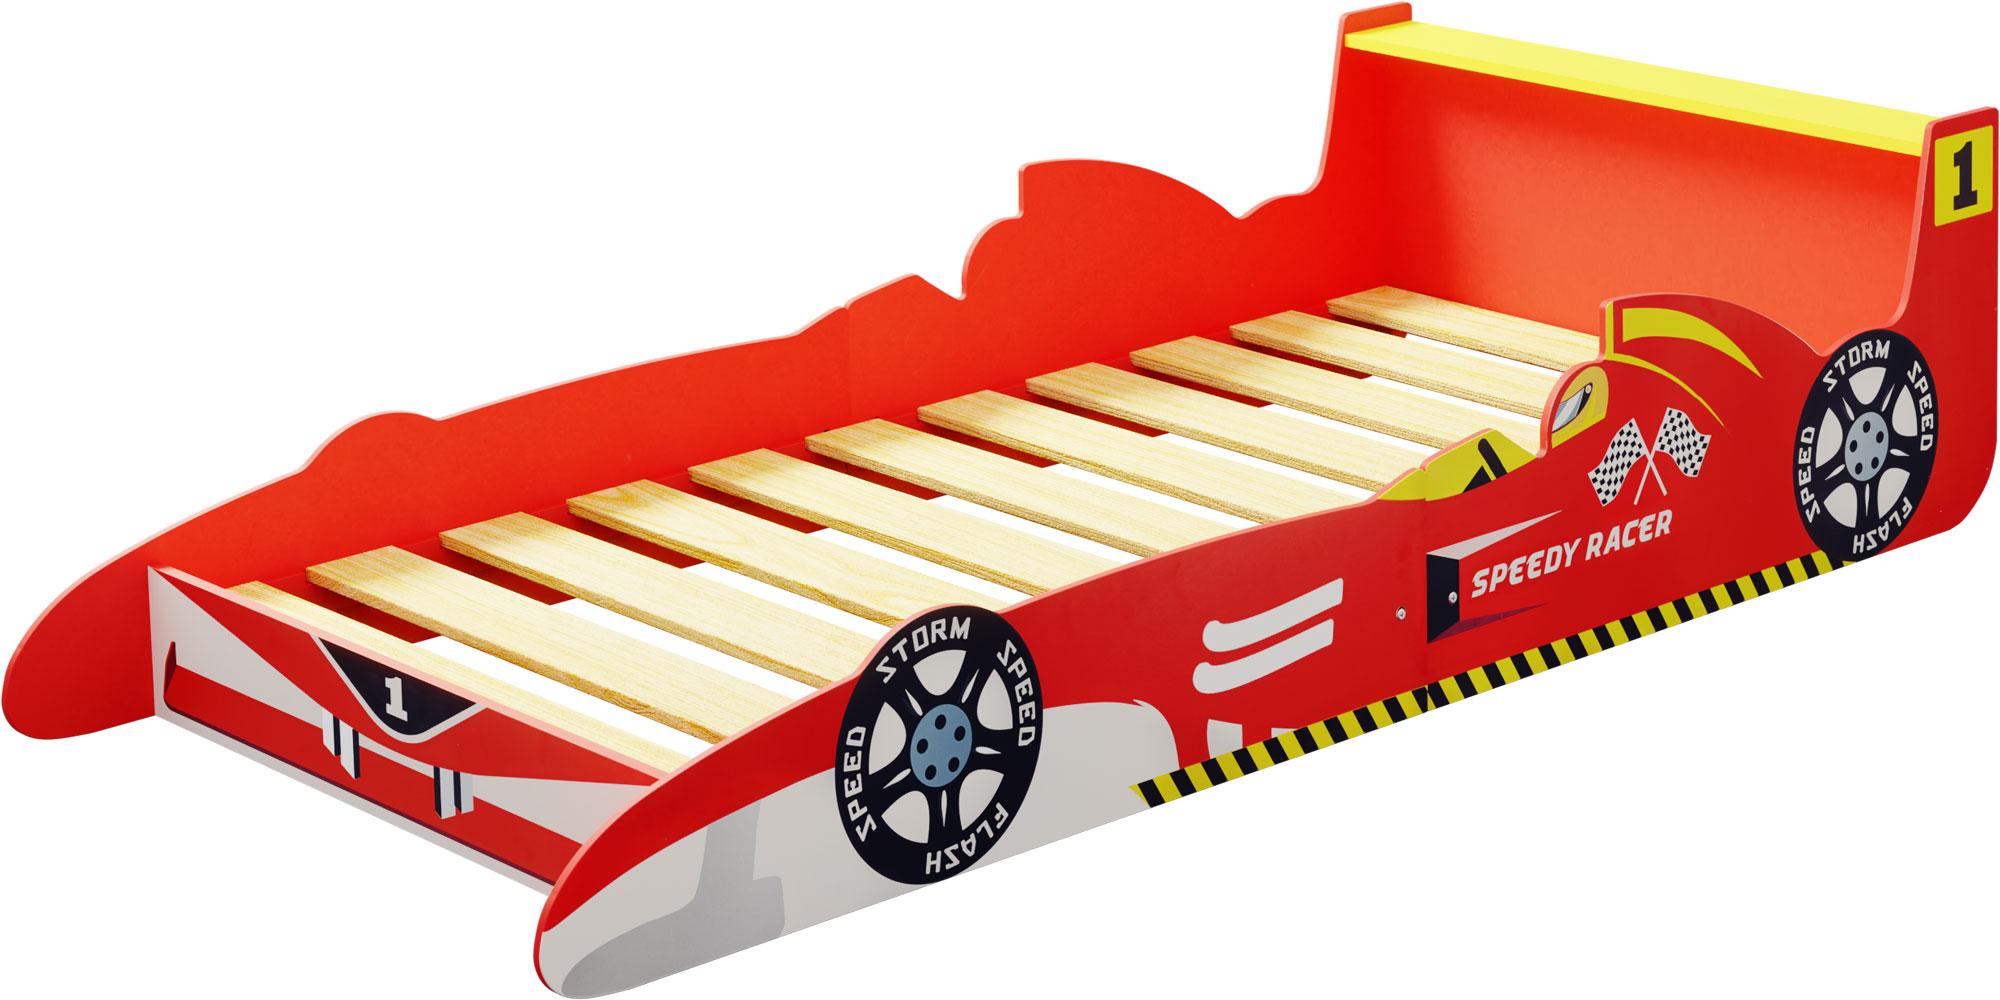 ib style speedy racer kinderbett 190 x 90 cm inkl lattenrost ib style. Black Bedroom Furniture Sets. Home Design Ideas